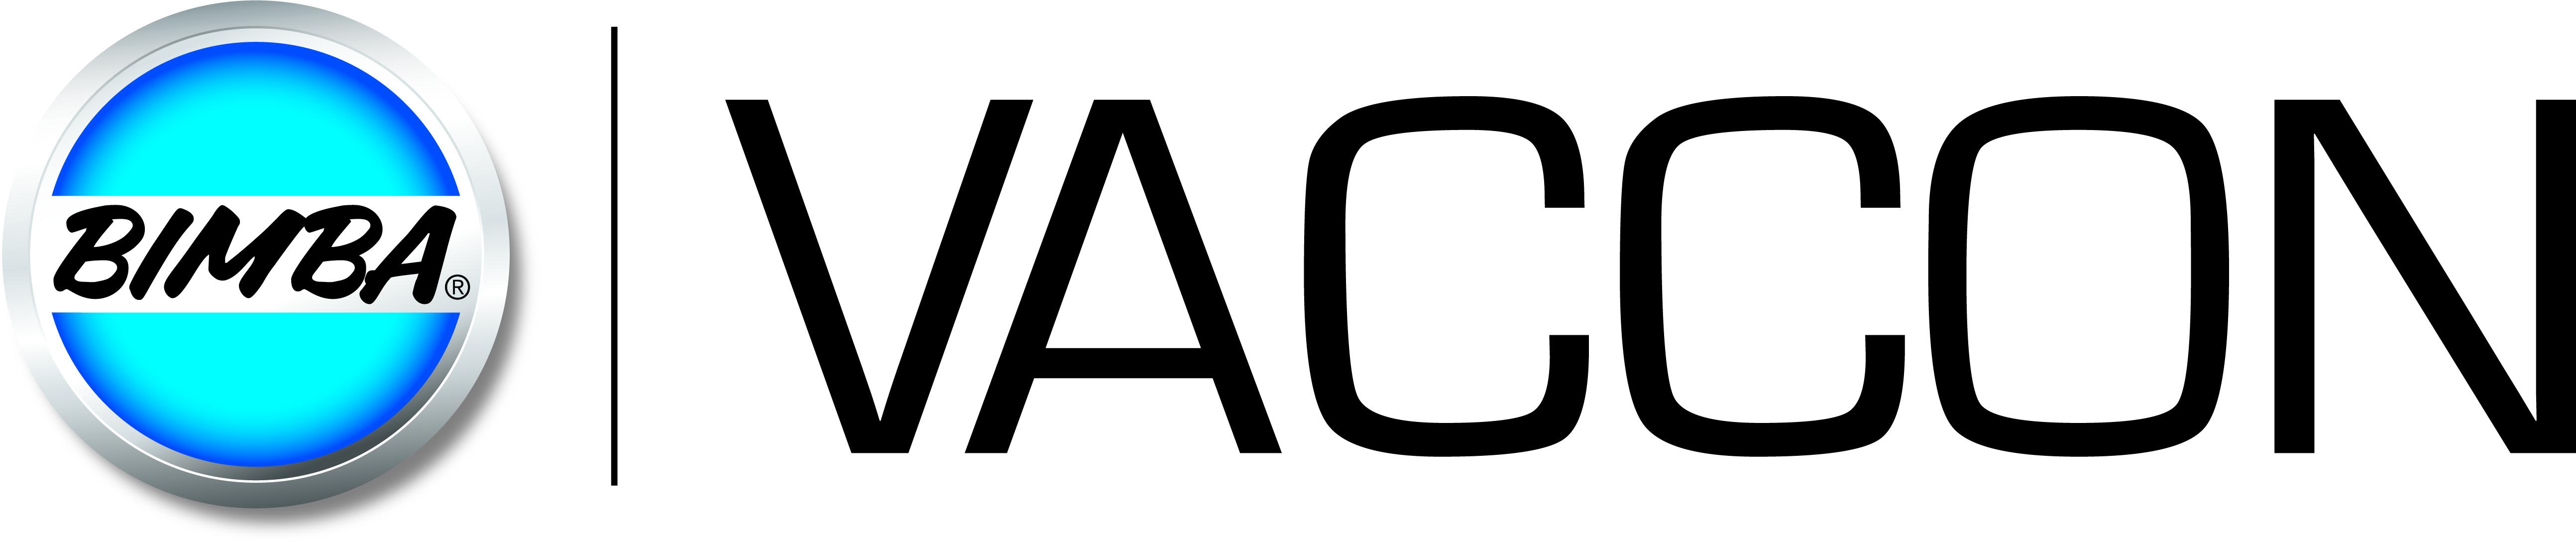 Vaccon_logo